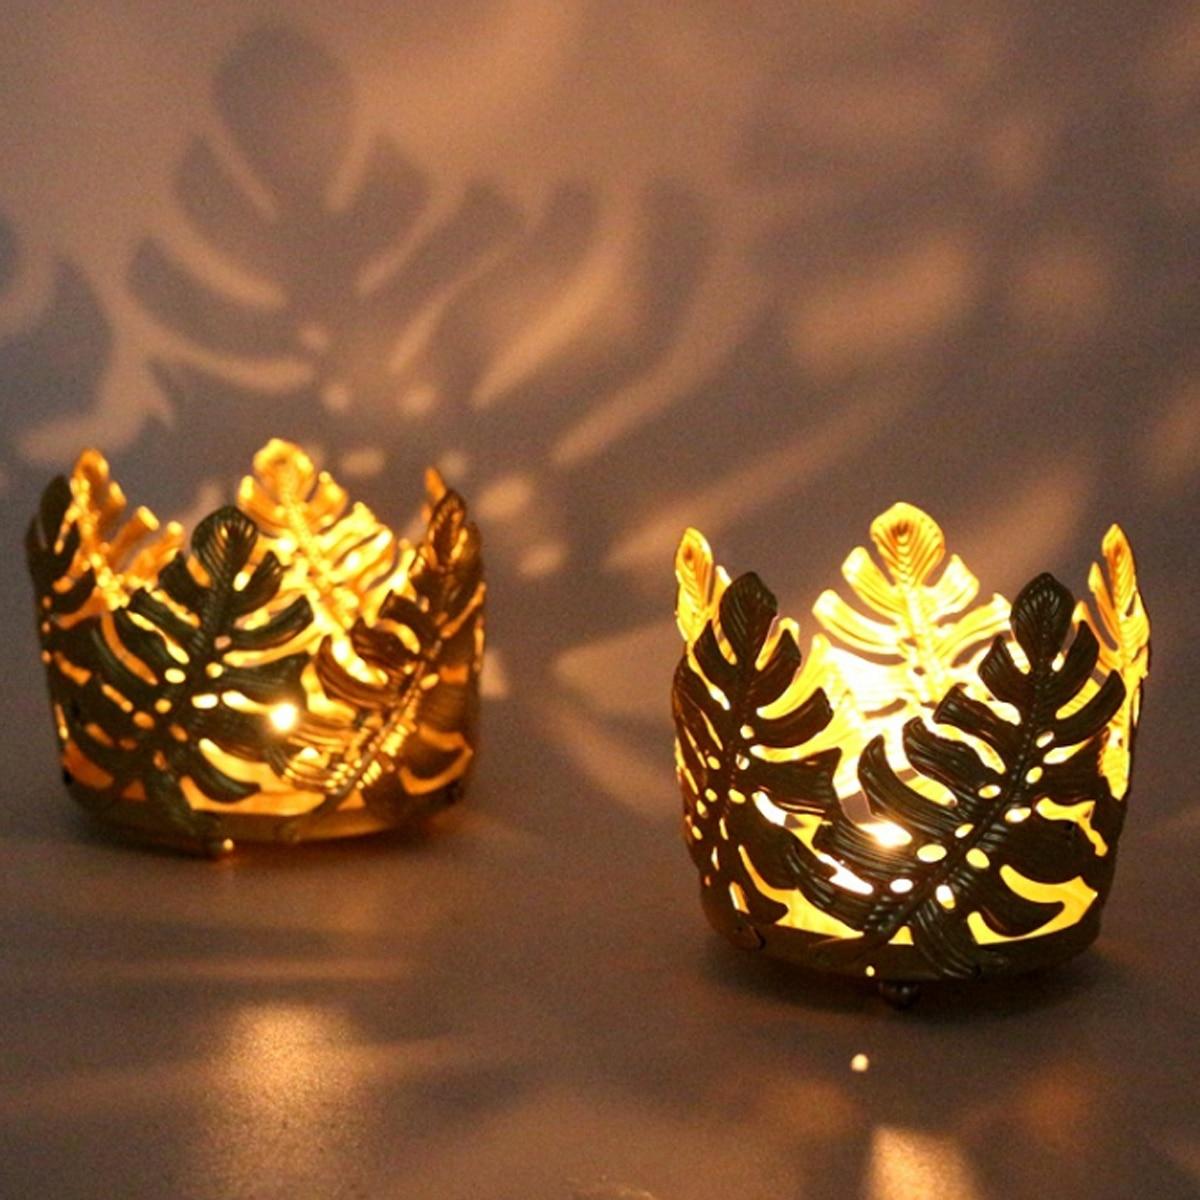 Faroot 2020 portavelas de vela de hojas doradas, estilo moderno de Metal candelabro Decoración de mesa para boda, cena, fiesta